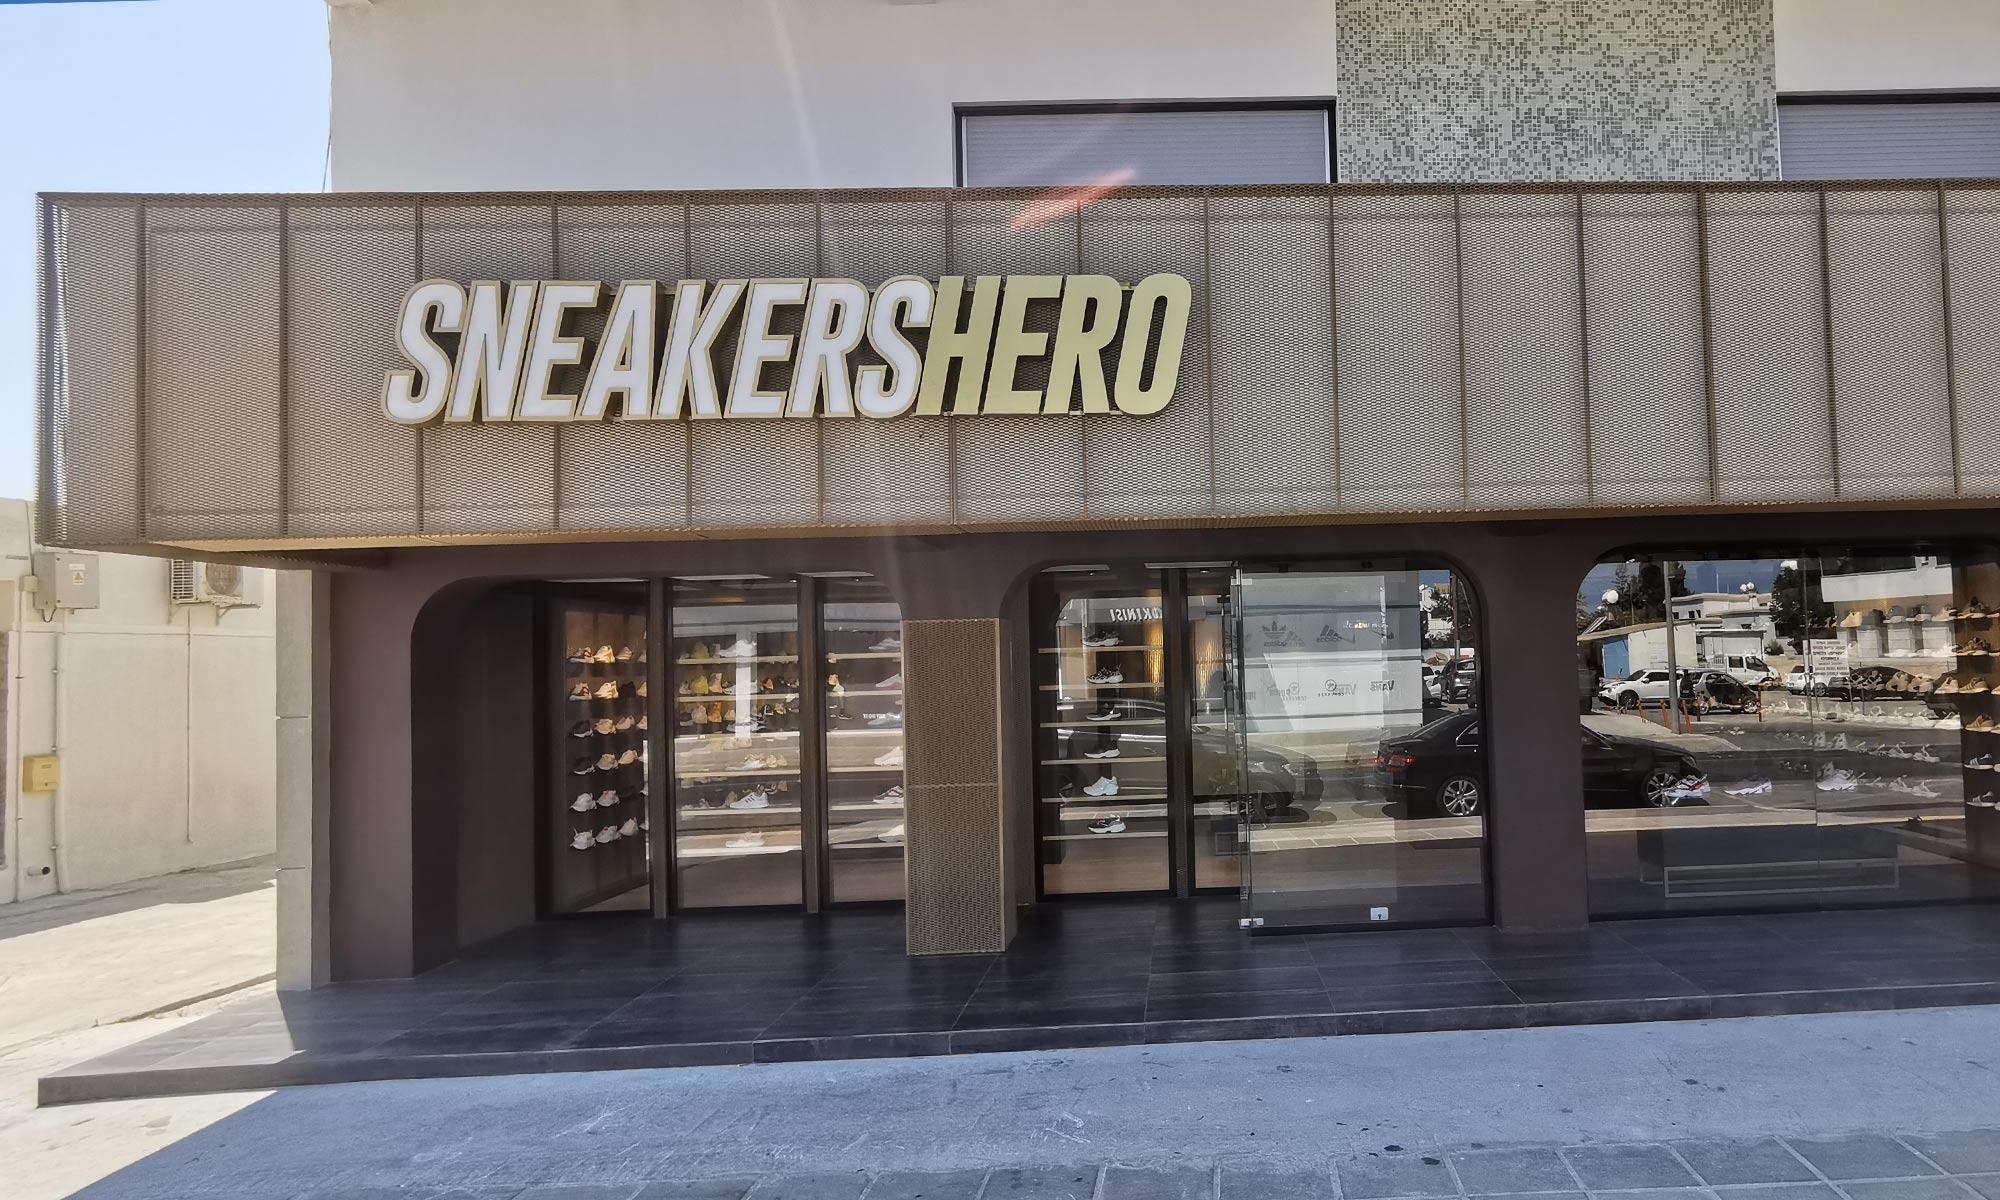 https://www.atelierzoz.com/wp-content/uploads/2020/03/works_atelierzoz_sneakershero-paralimni-3.jpg